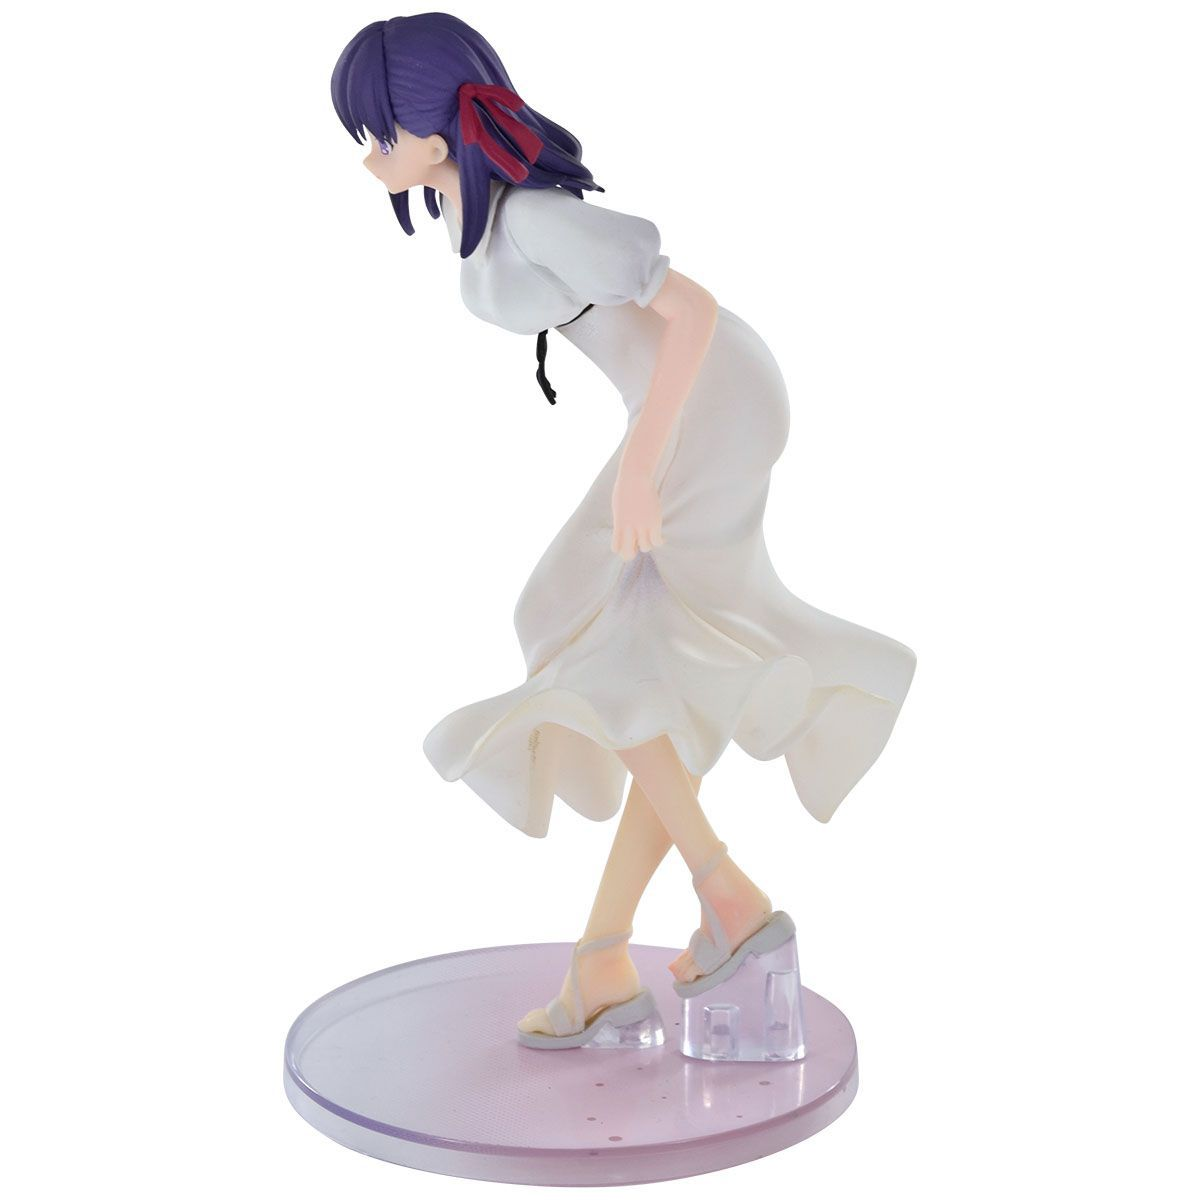 Action Figure Sakura Matou: Fate Stay Night (Boneco Colecionável) - Banpresto